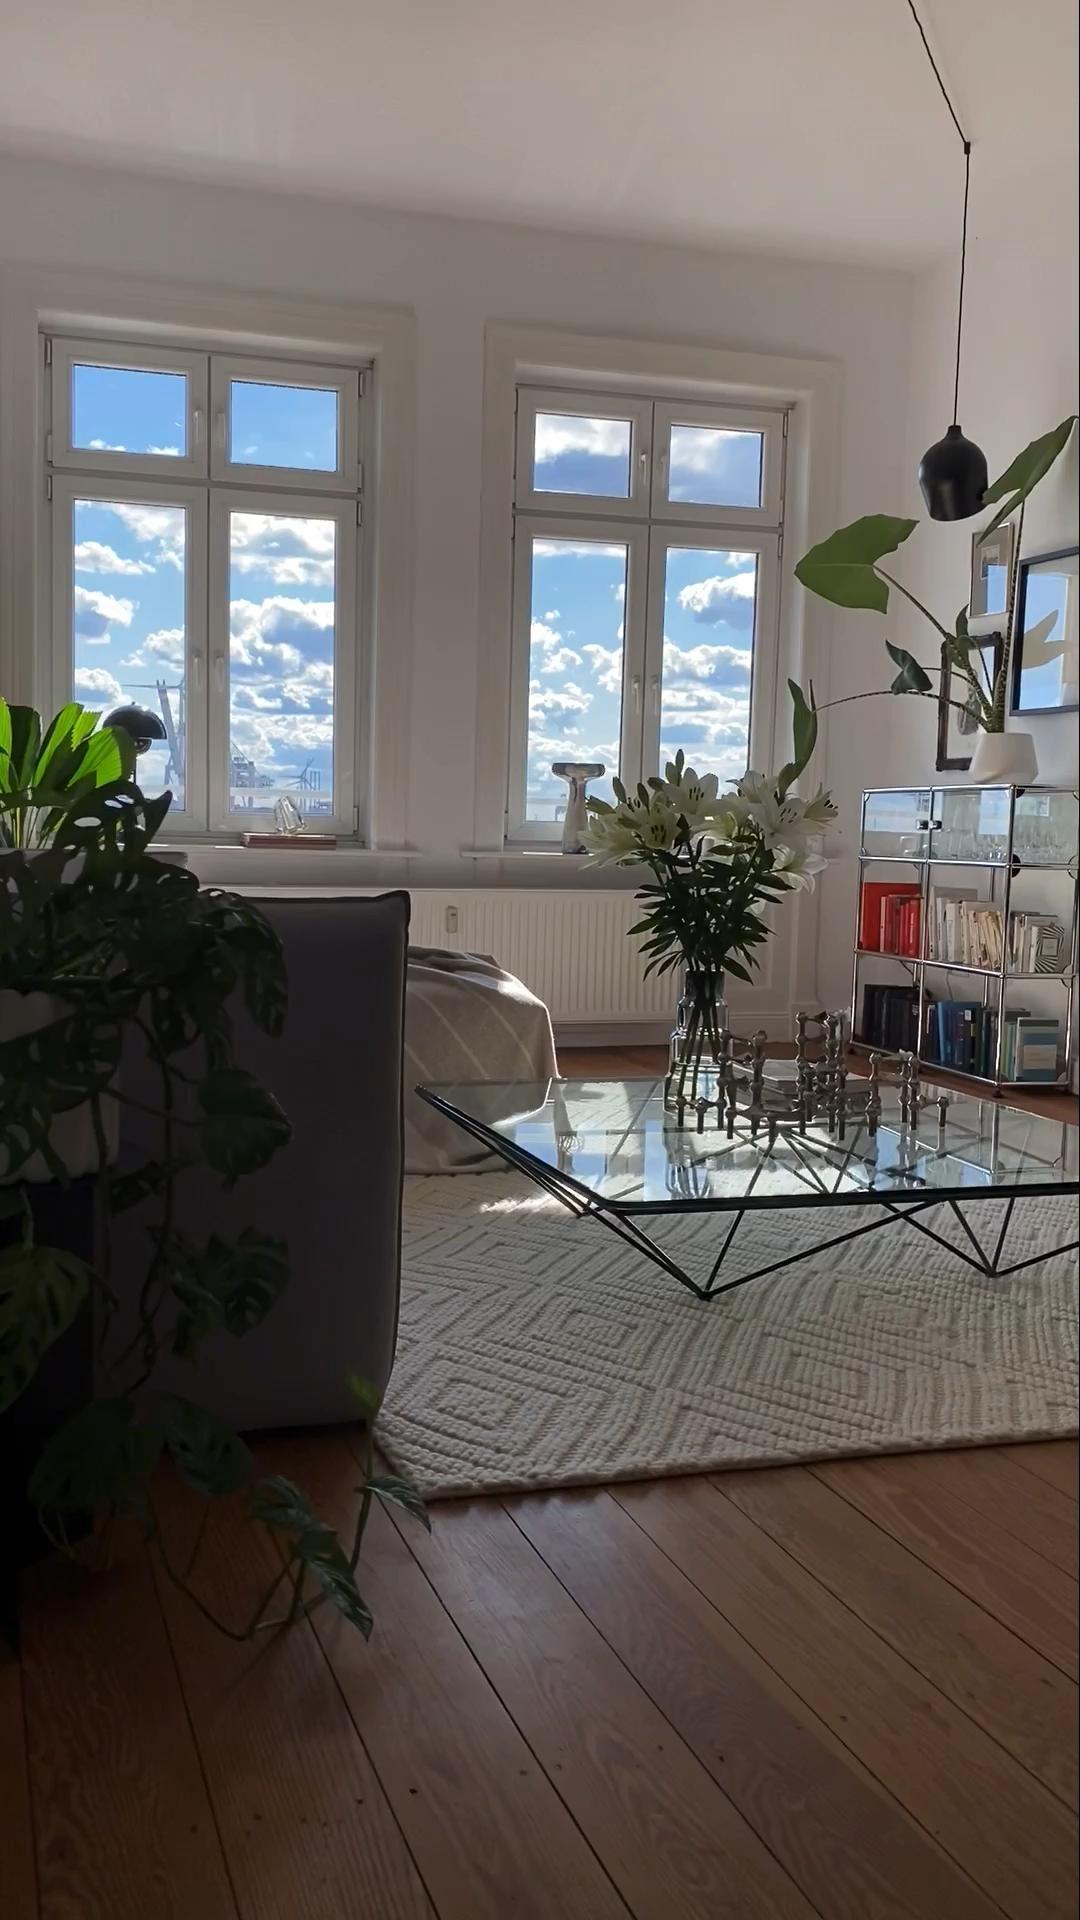 #wohnzimmer #livingroomdecor #dekoration #livingroomdesigns #livingroomfurniture #plants  #wohnen  #bebitalia #alanda #elbdock #otto #sofa